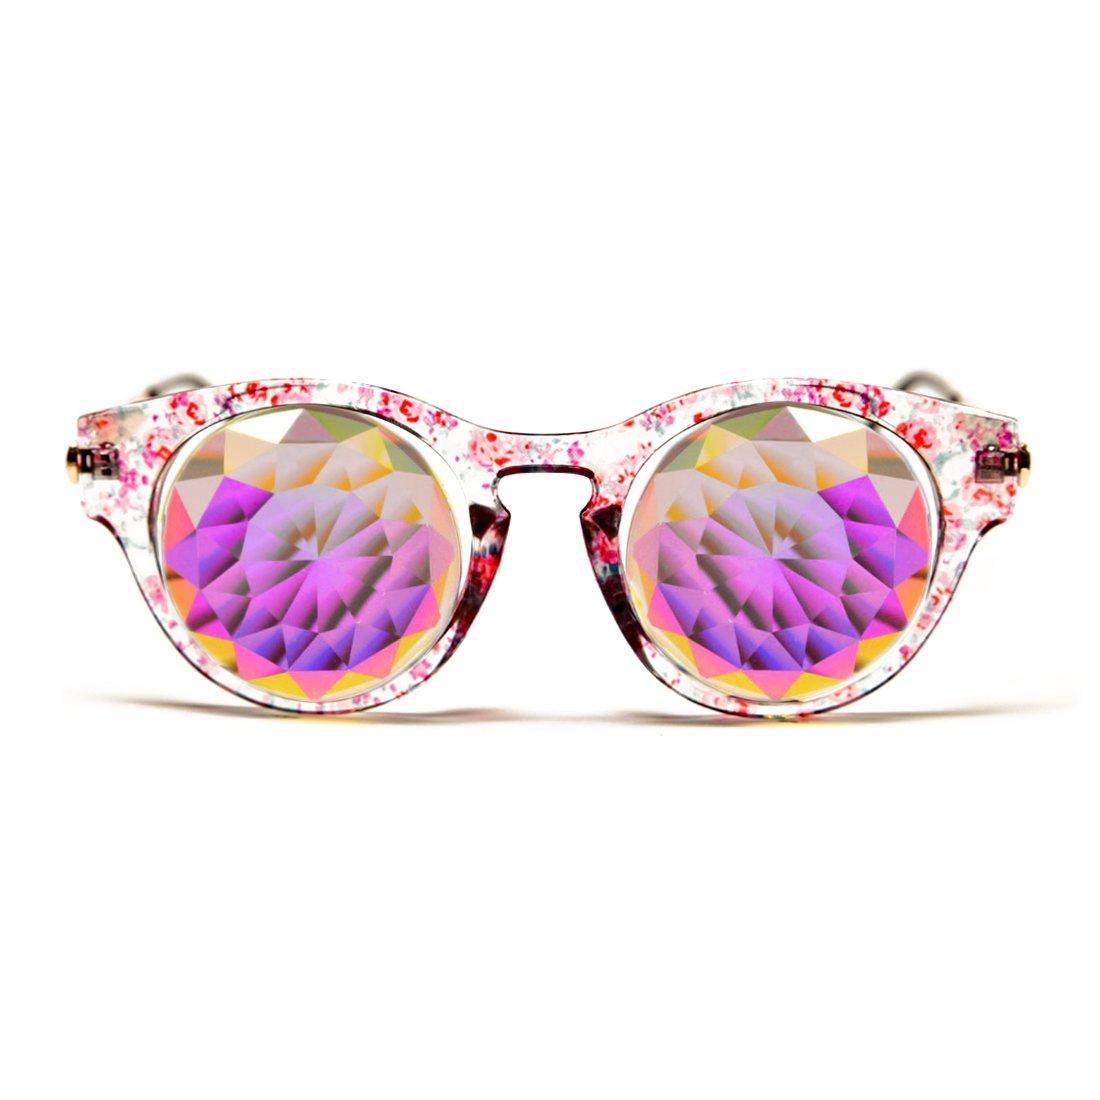 GloFX Floral Cat Eye Kaleidoscope Glasses – Rainbow Fractal Prism 3D Glass Crystal